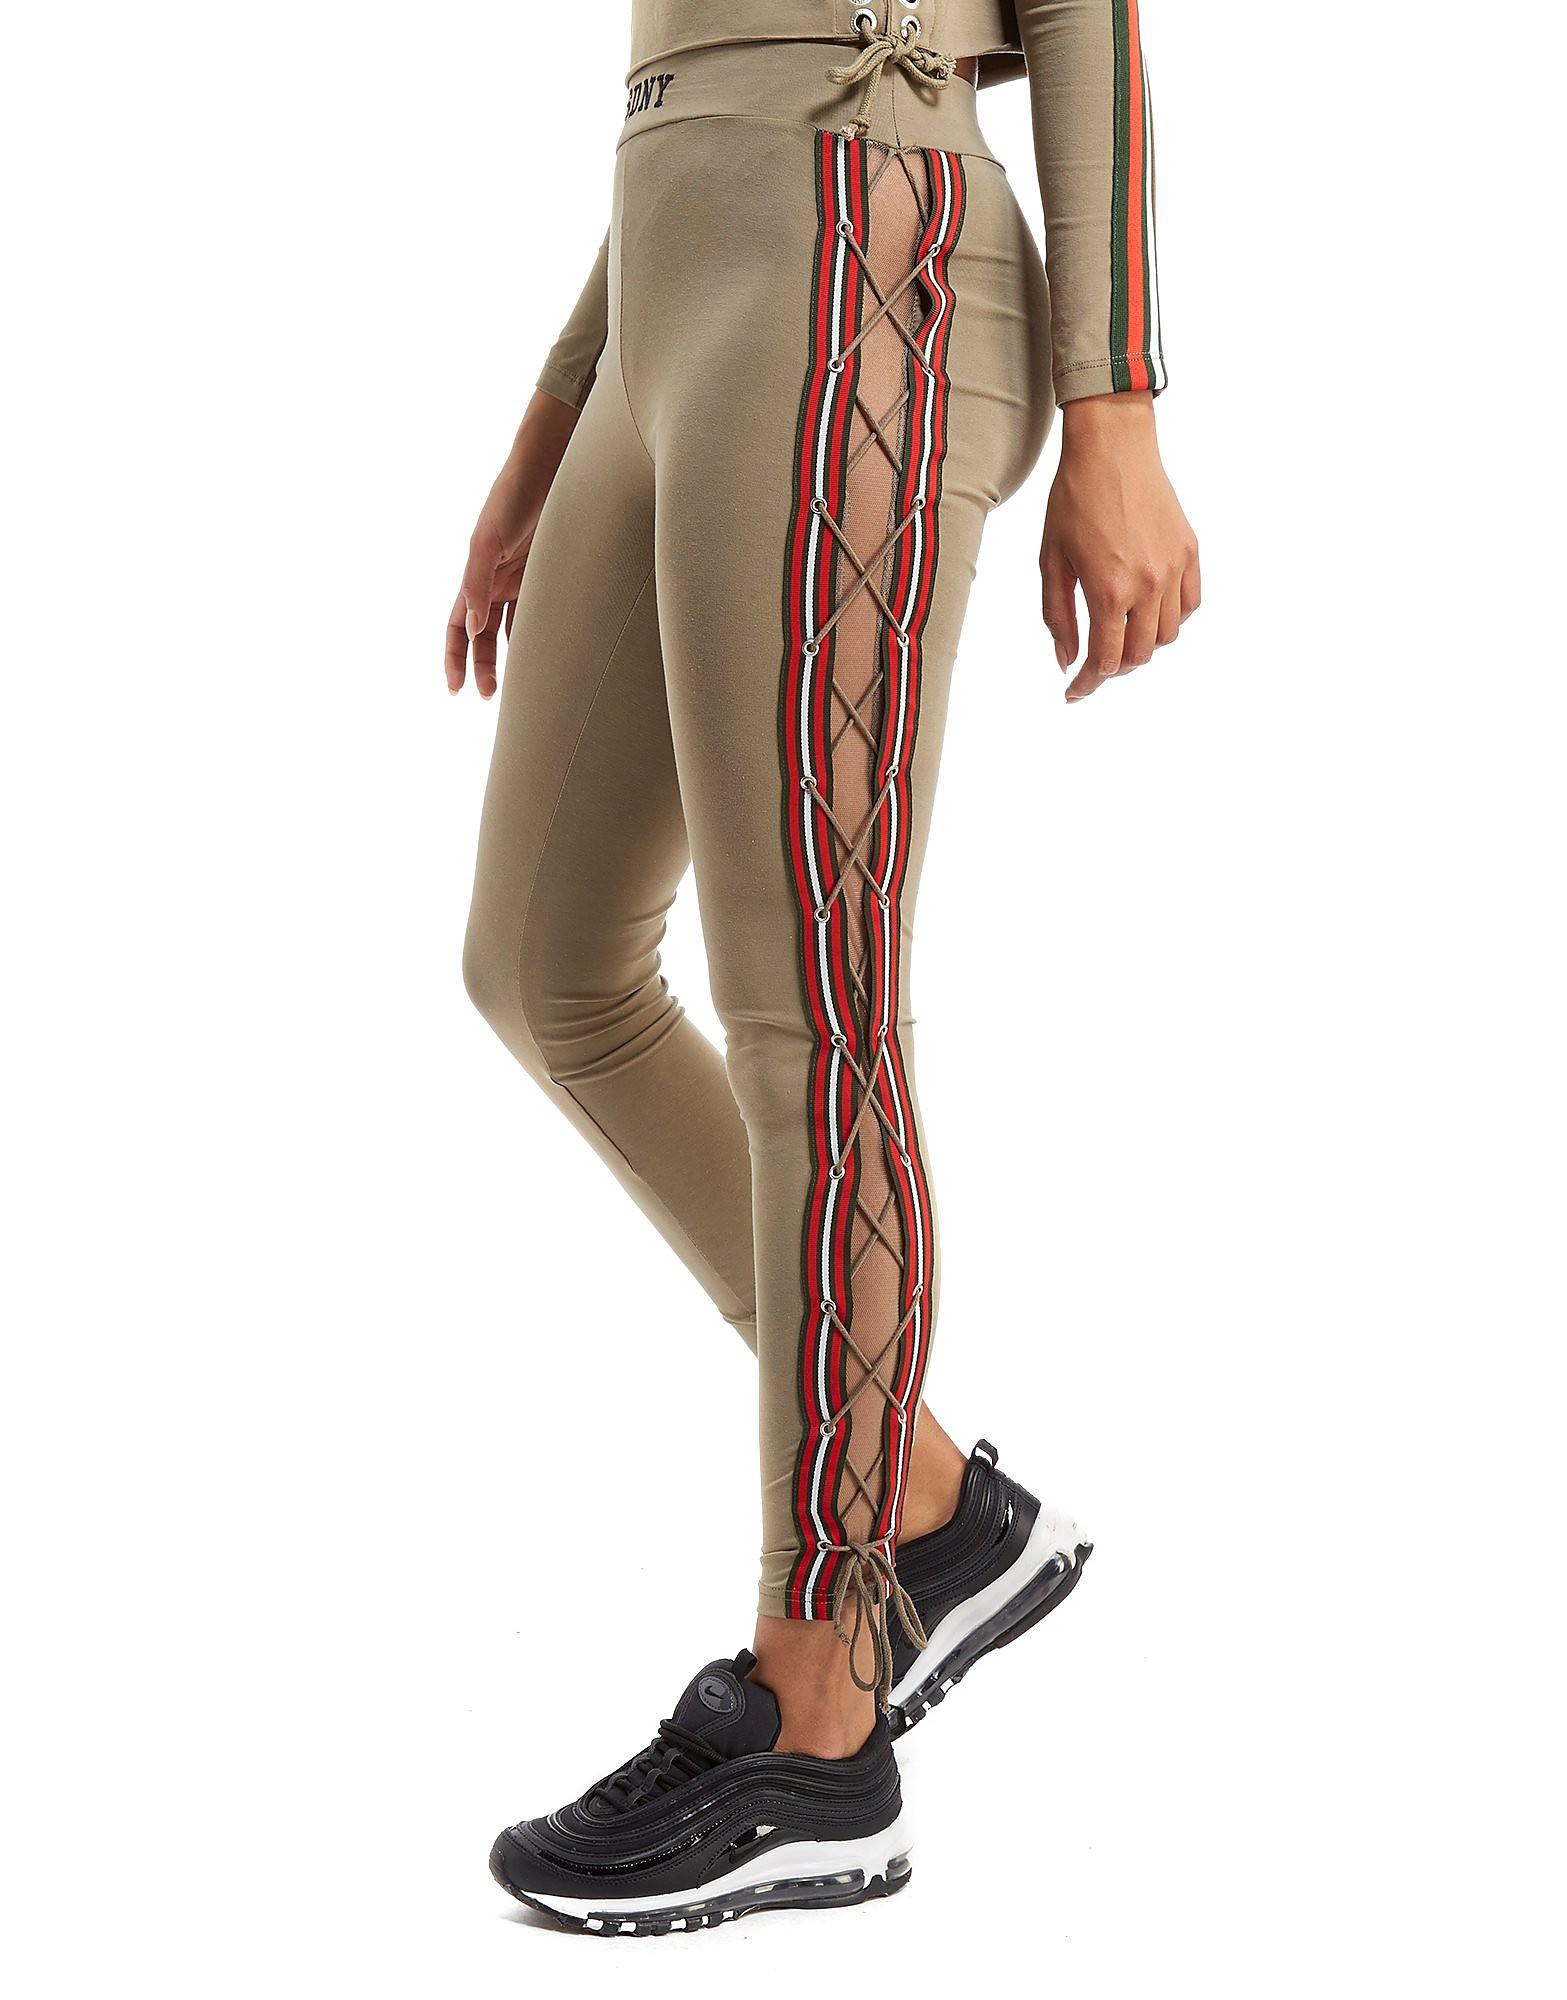 Supply & Demand leggings Lace Tape